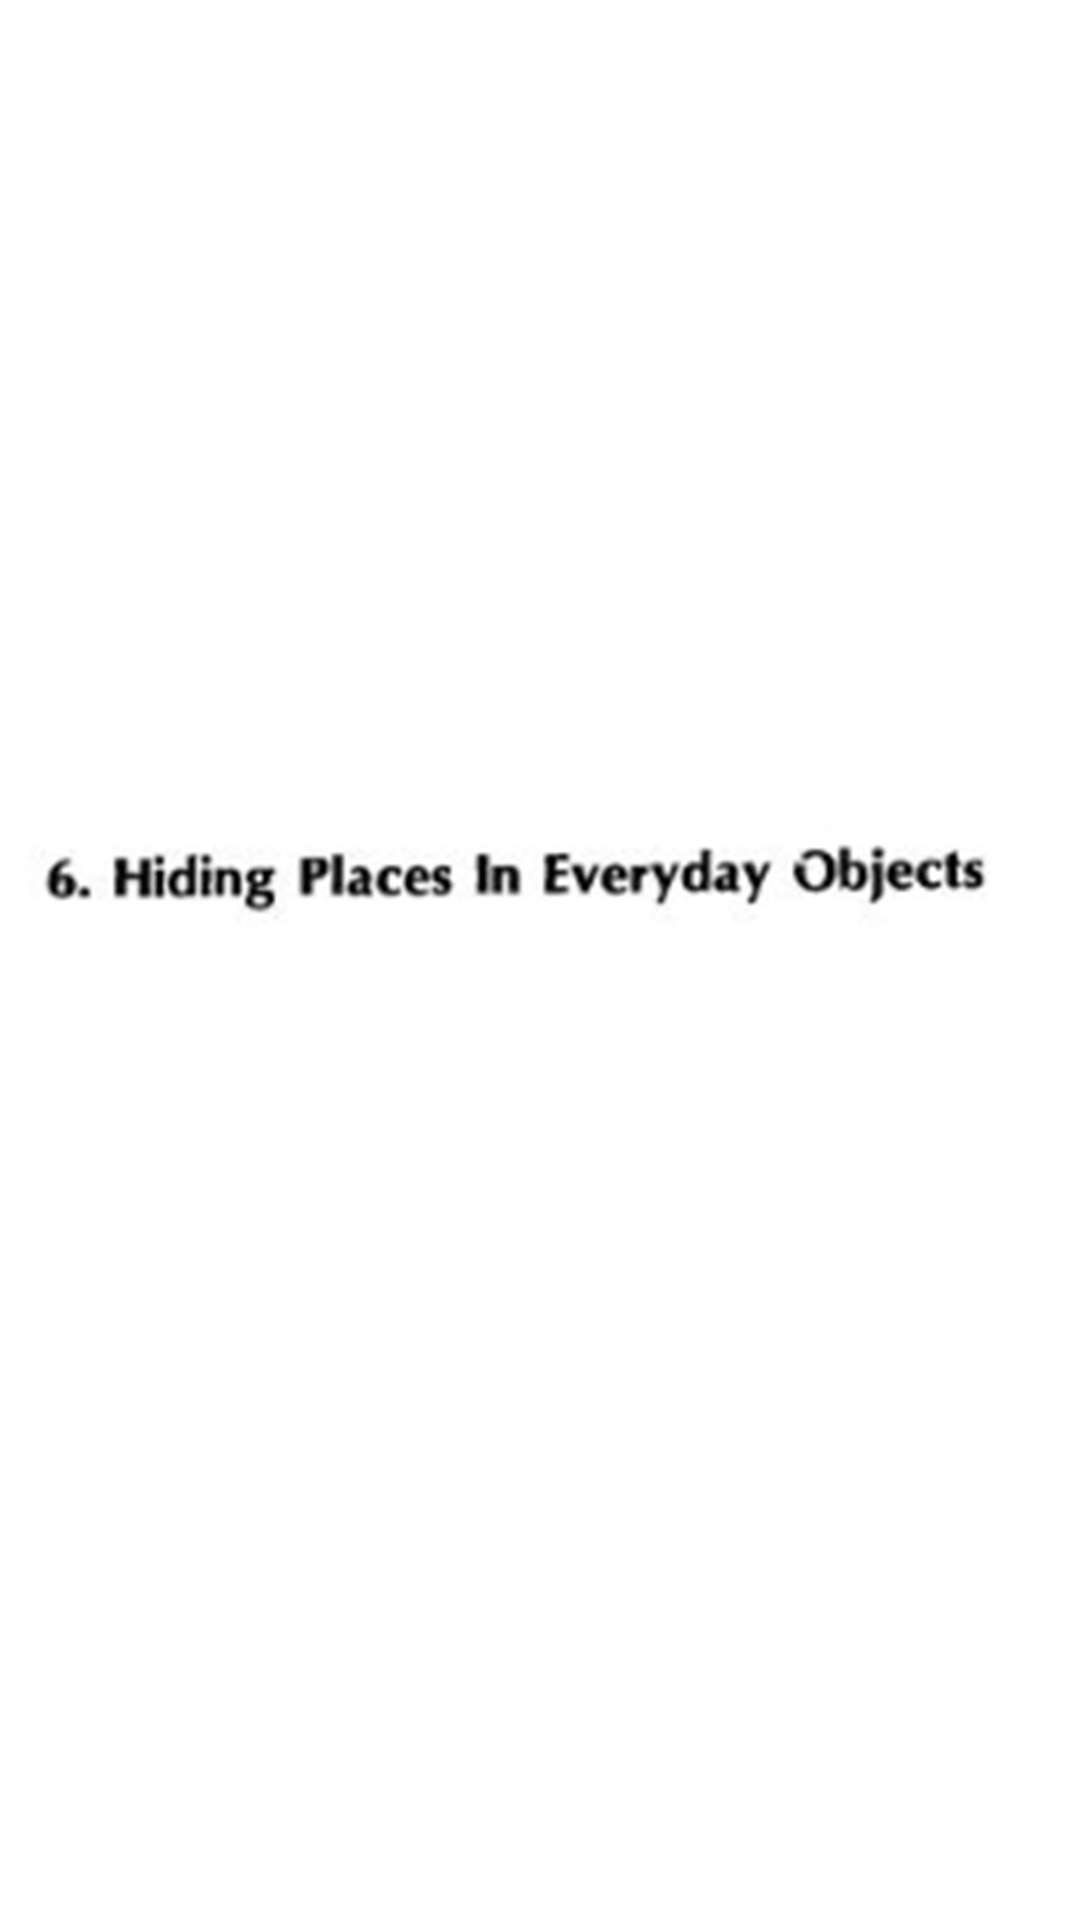 hidingeverydayobjects.jpg